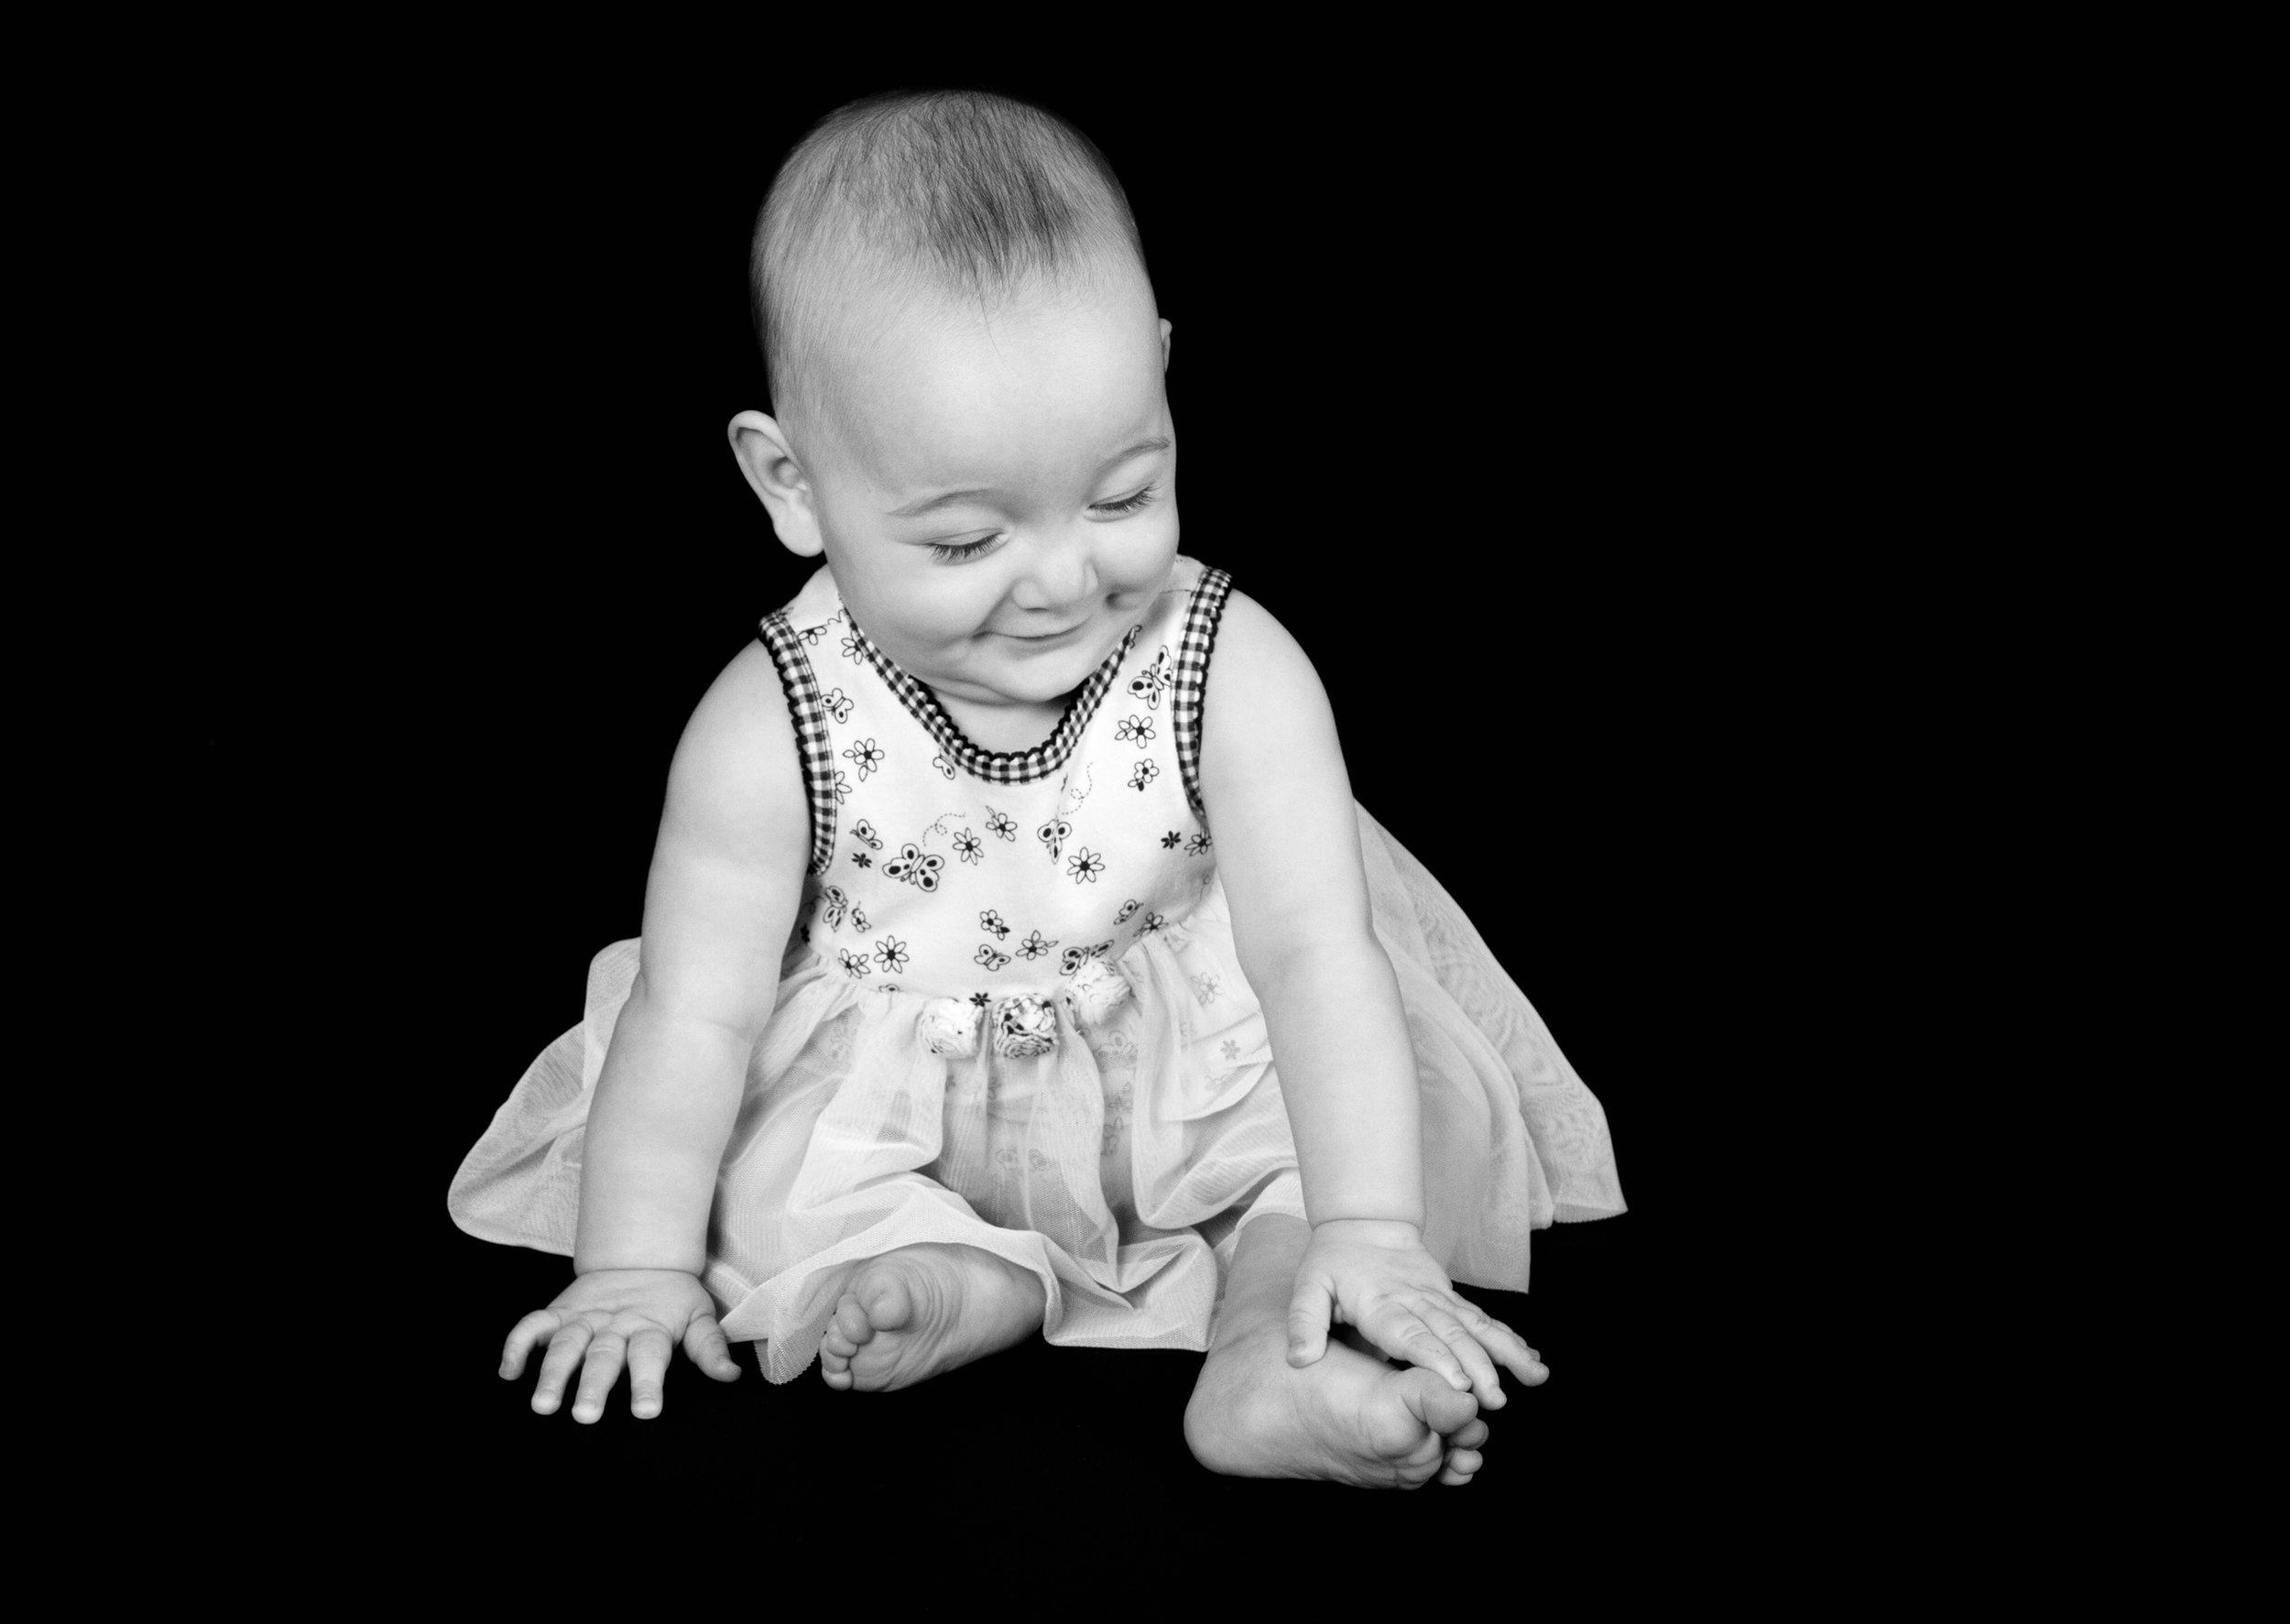 Smiling Baby.jpg